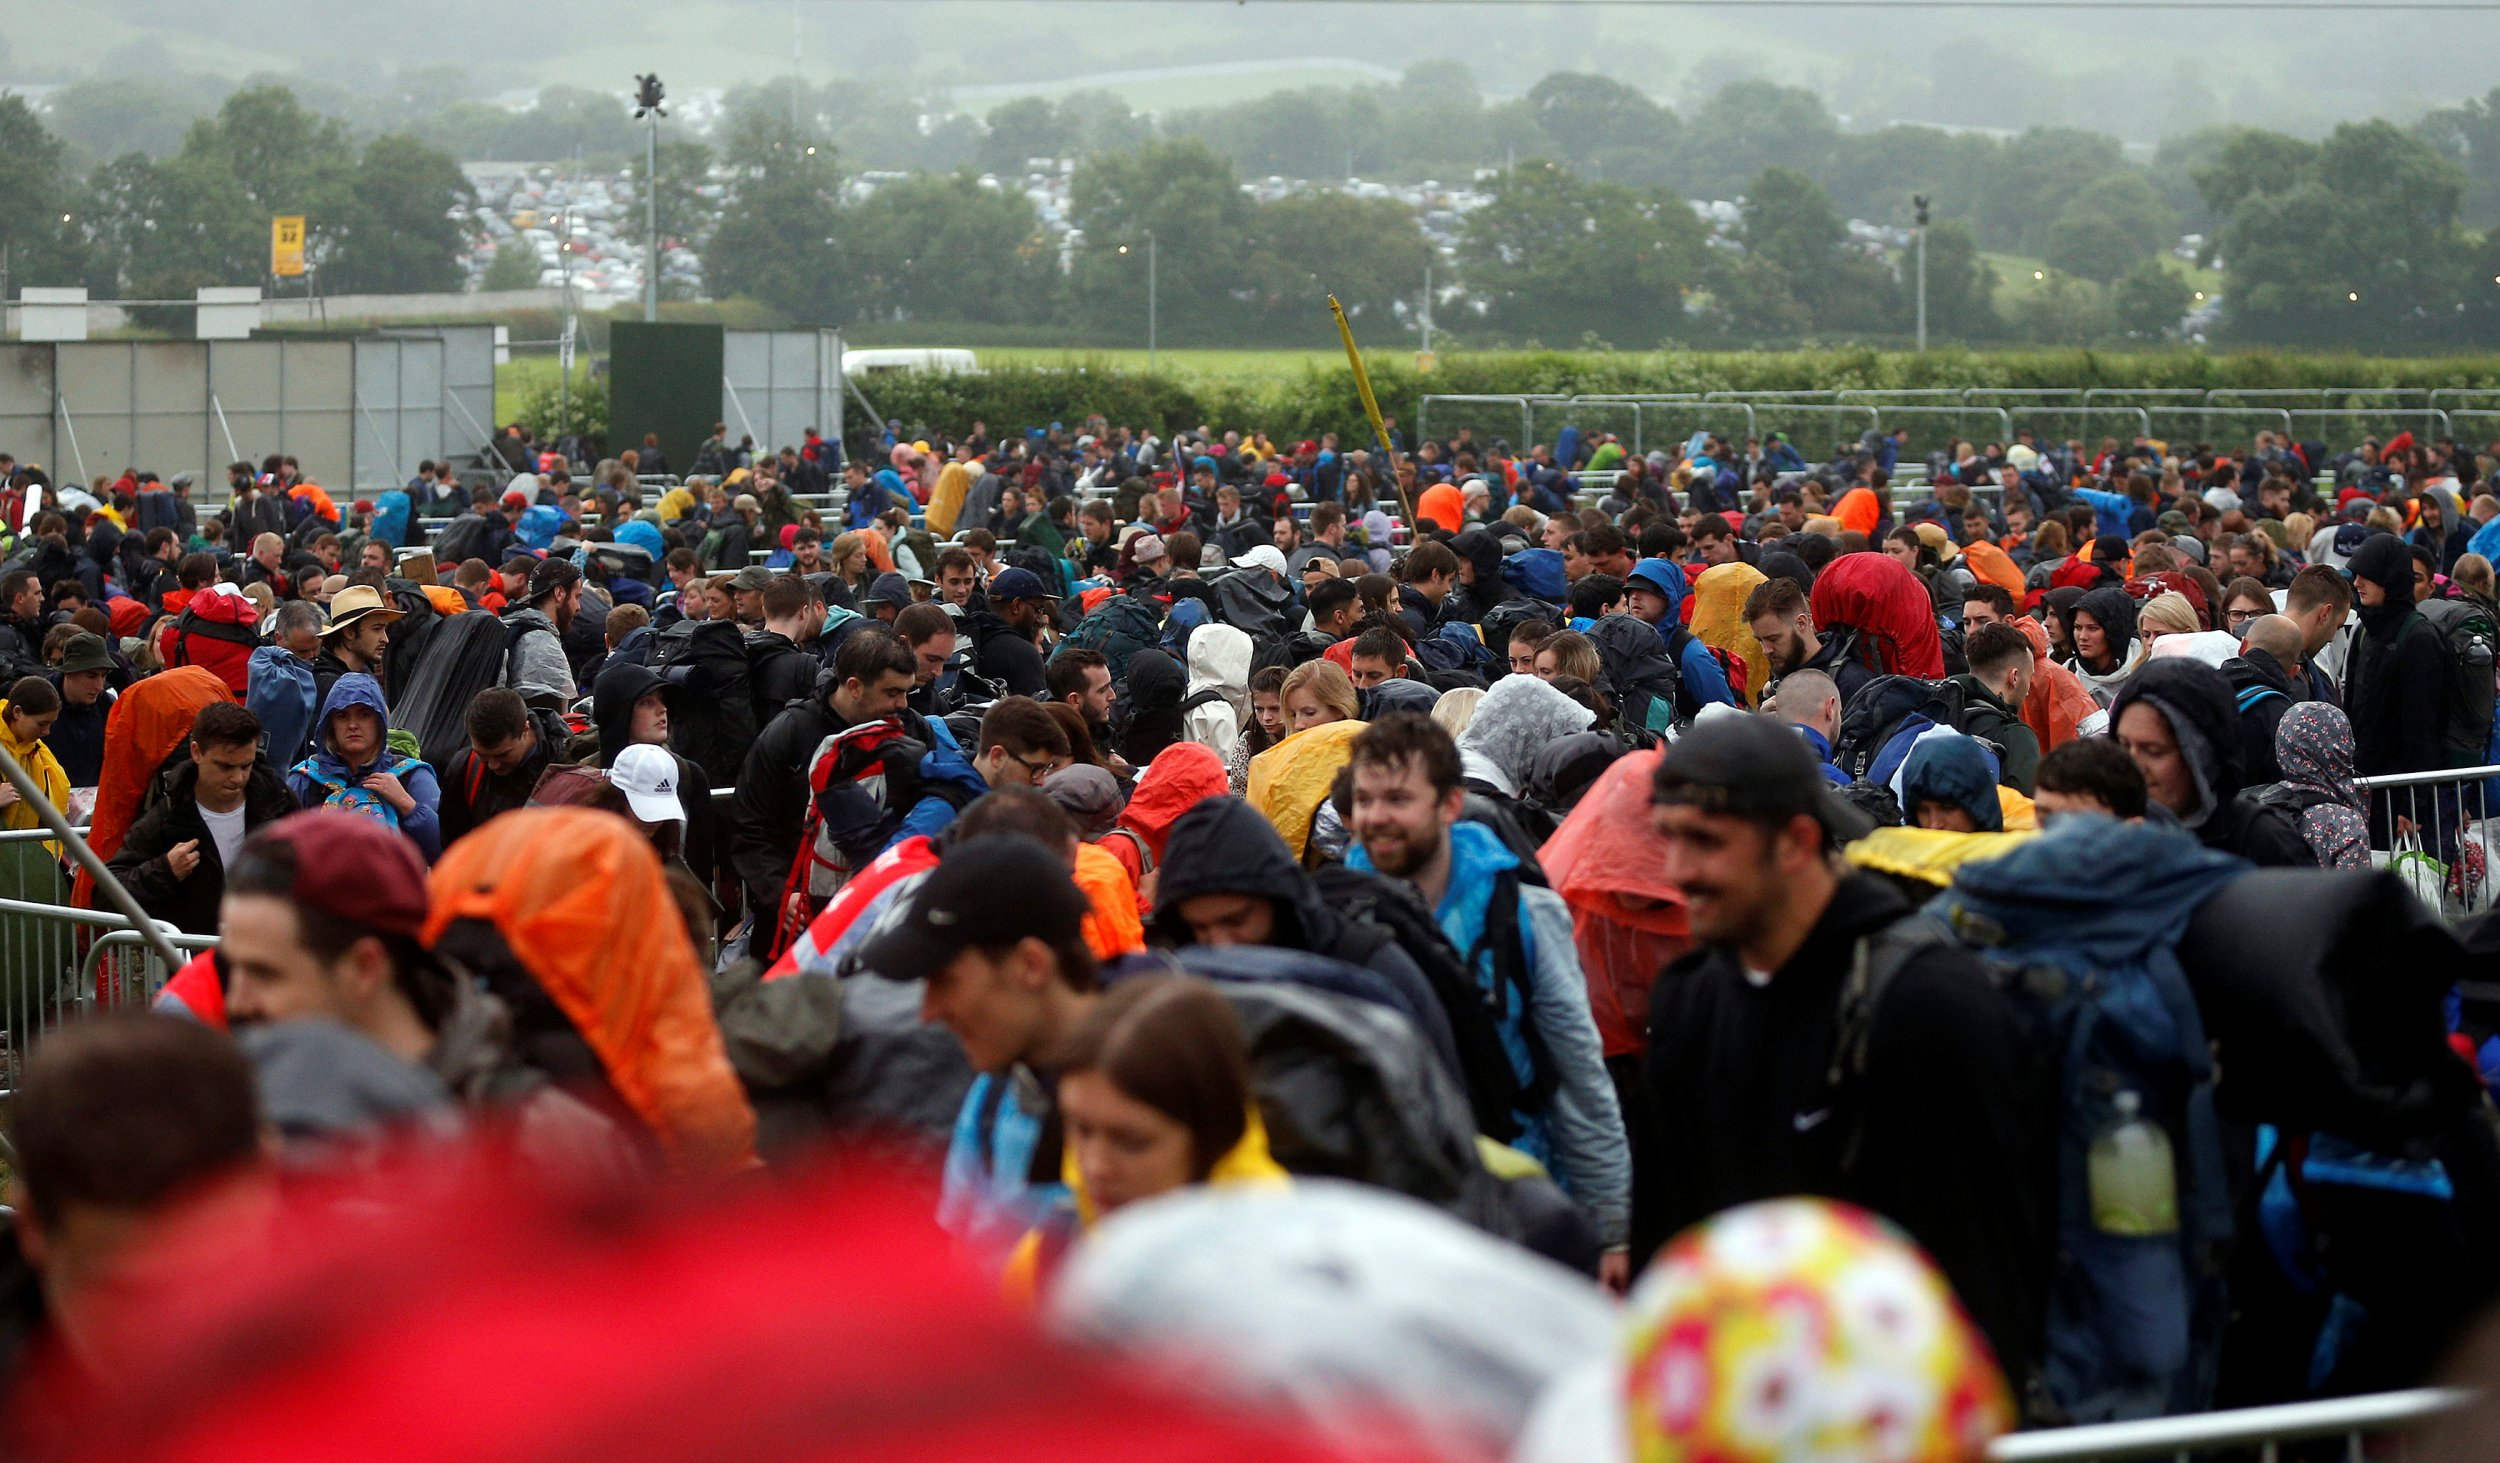 Glastonbury 2016 crowds